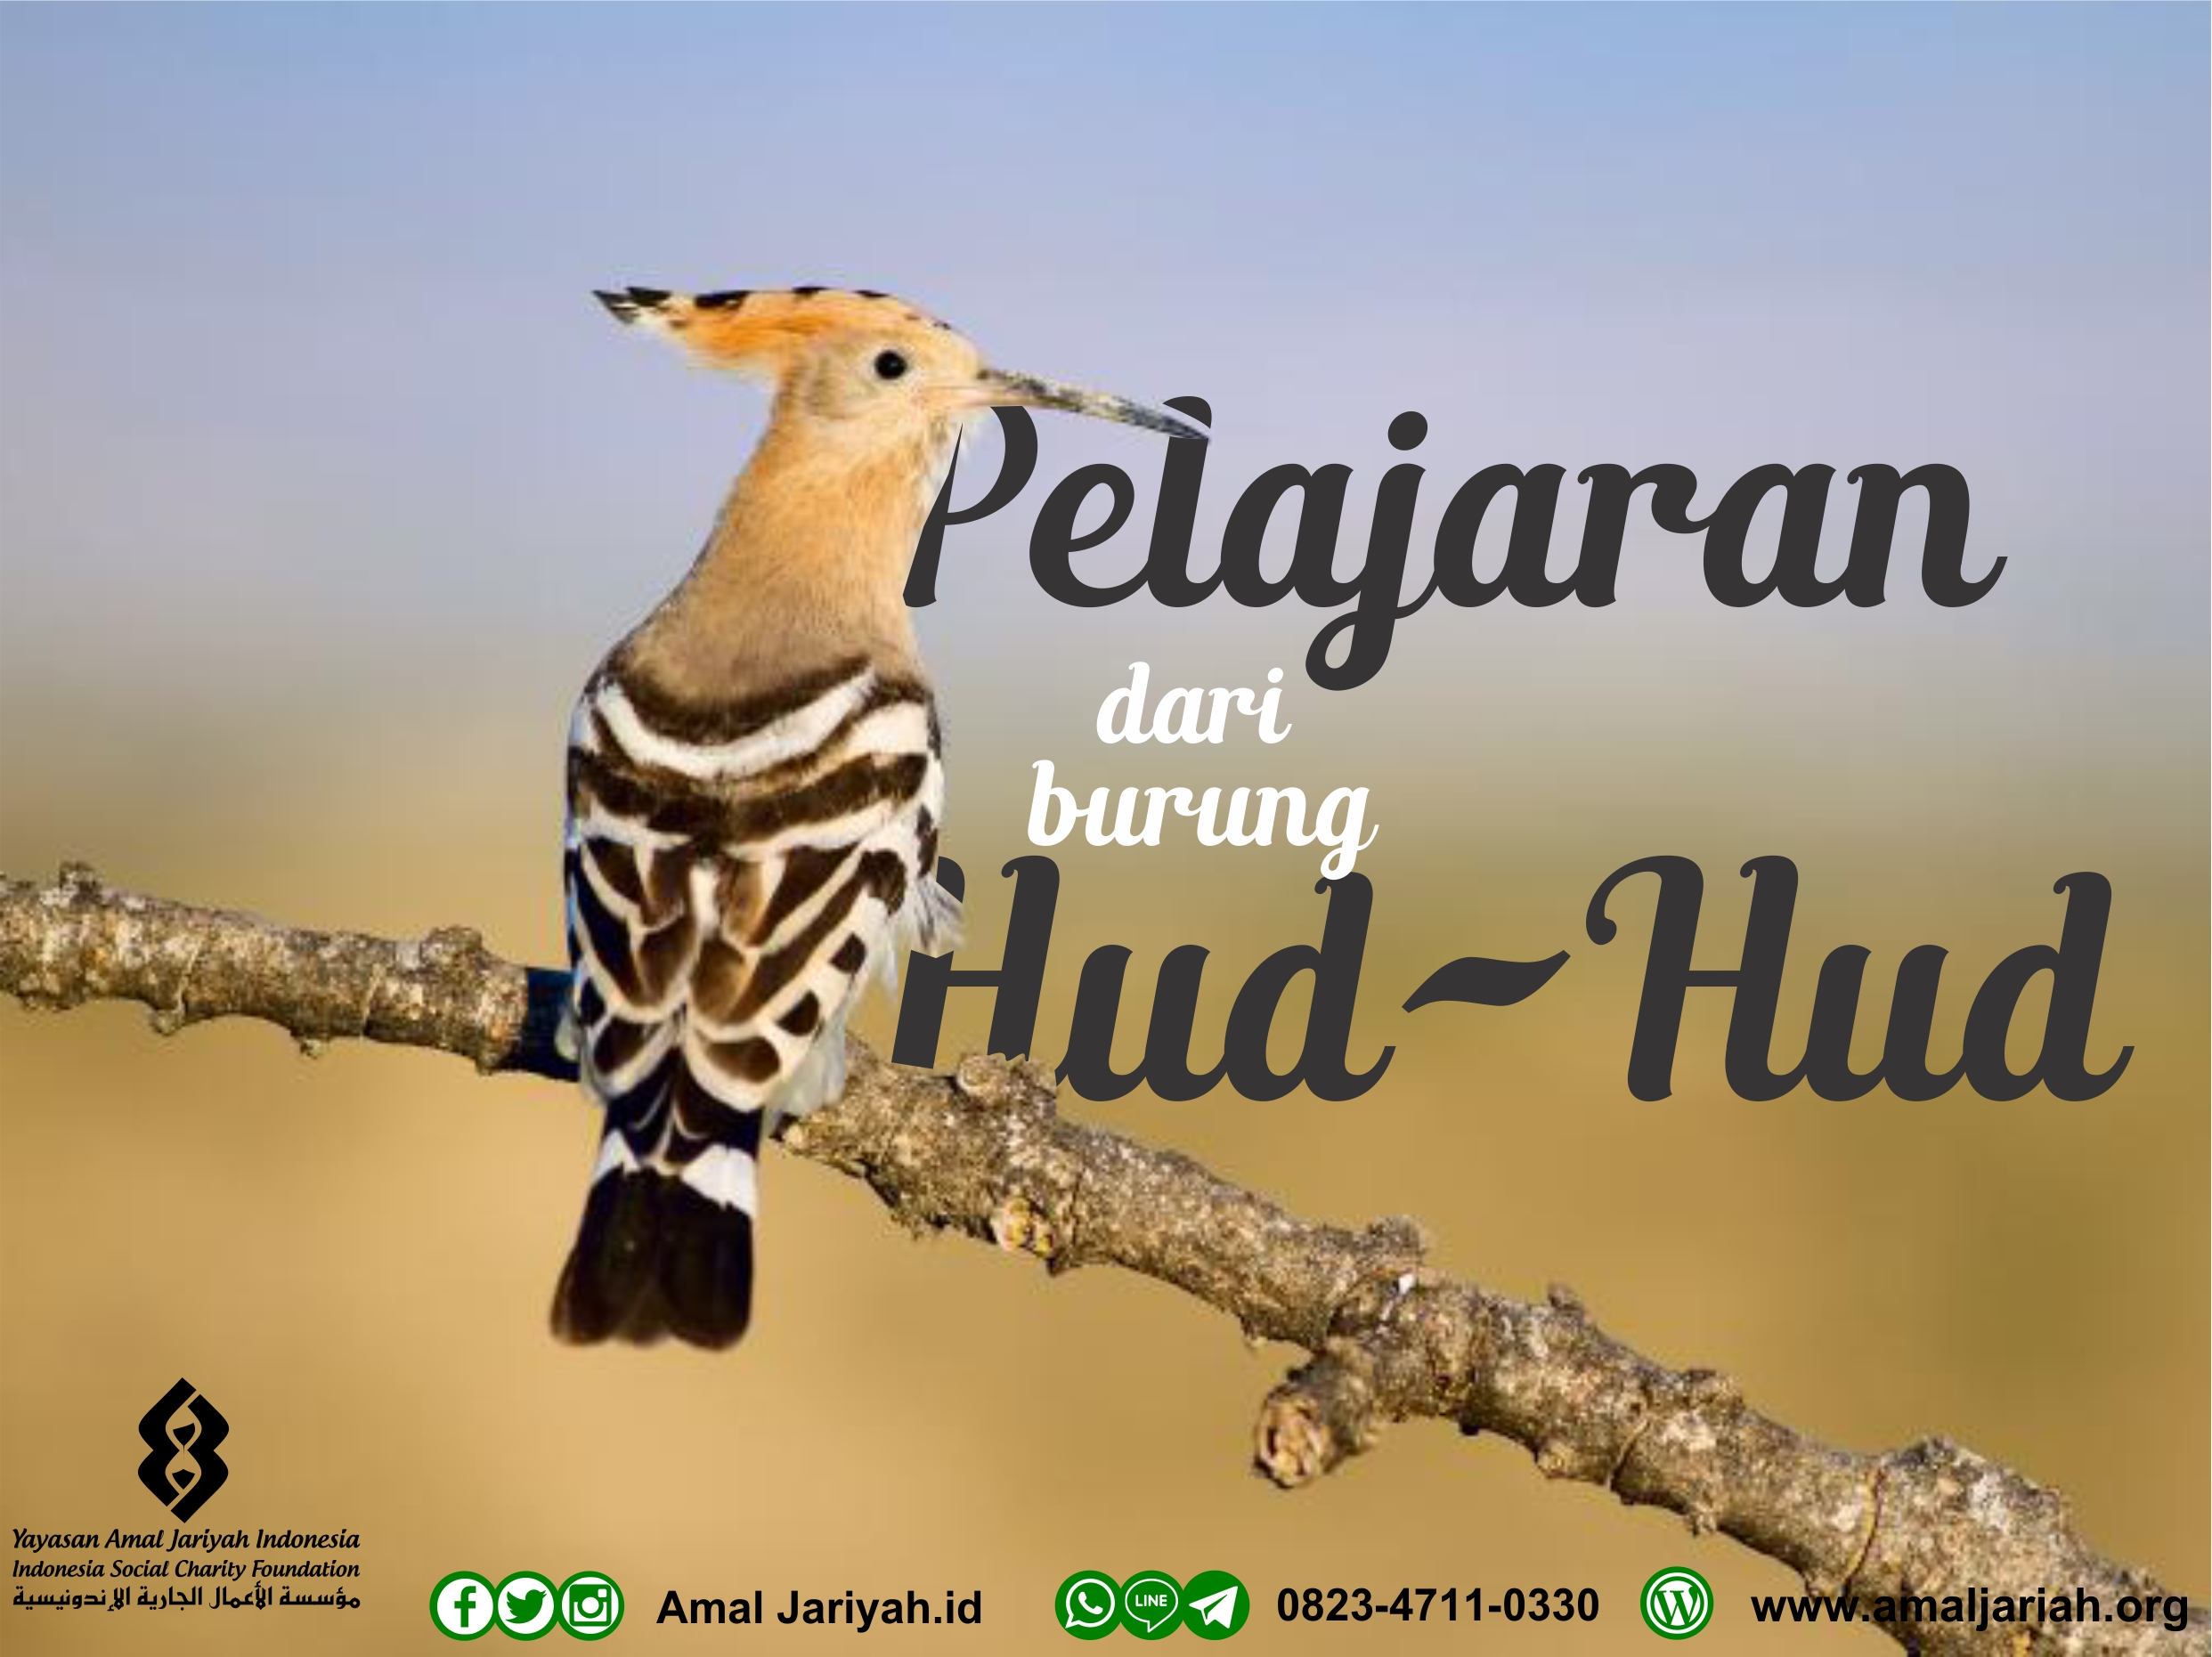 Burung Hud Hud In English